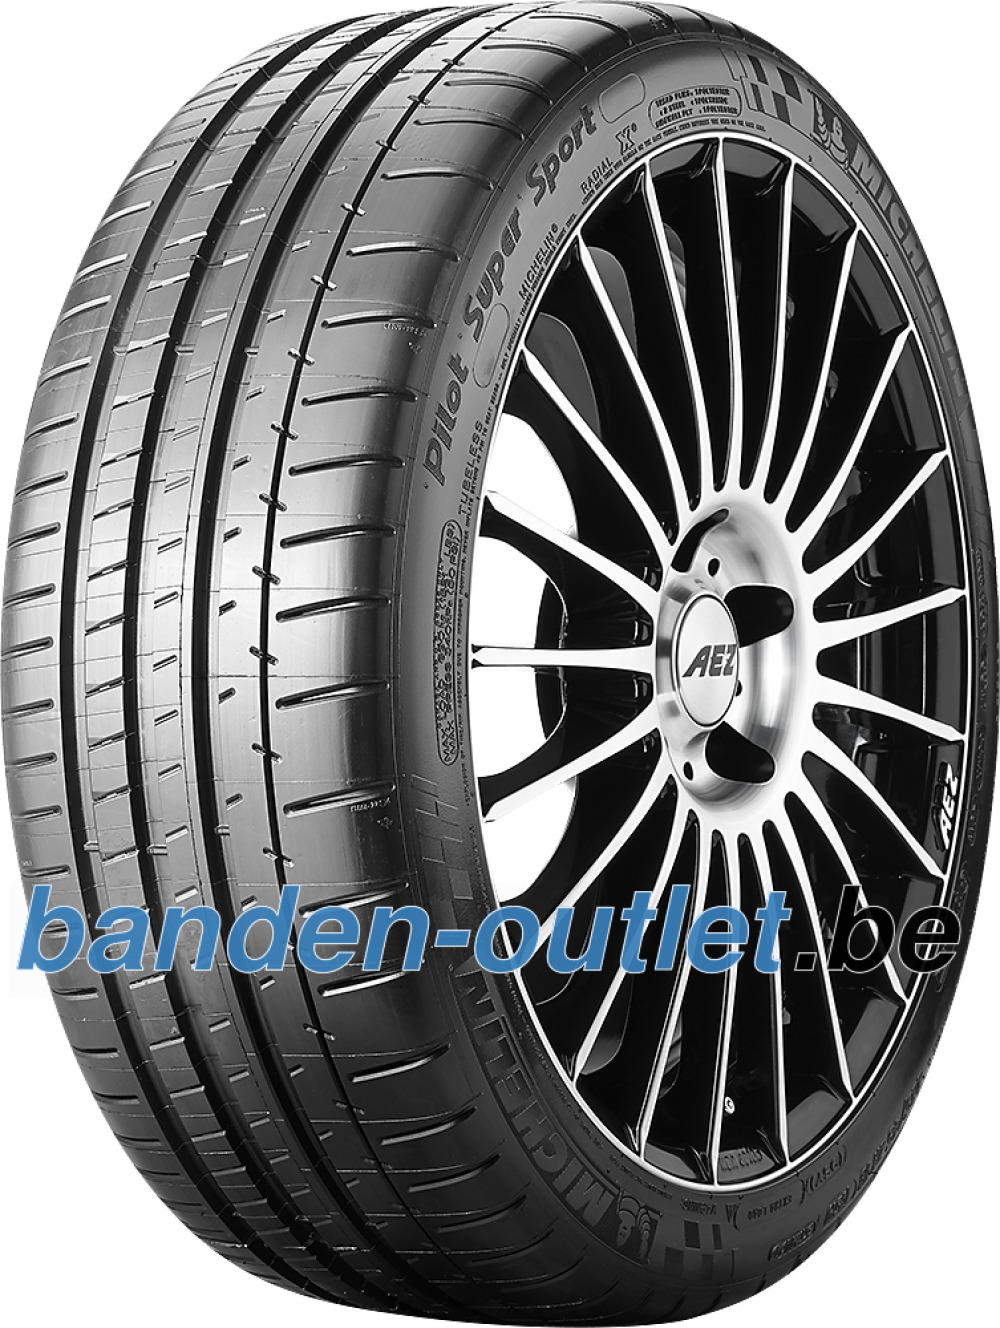 Michelin Pilot Super Sport ( 215/45 ZR17 (91Y) XL met wangbescherming (FSL) )